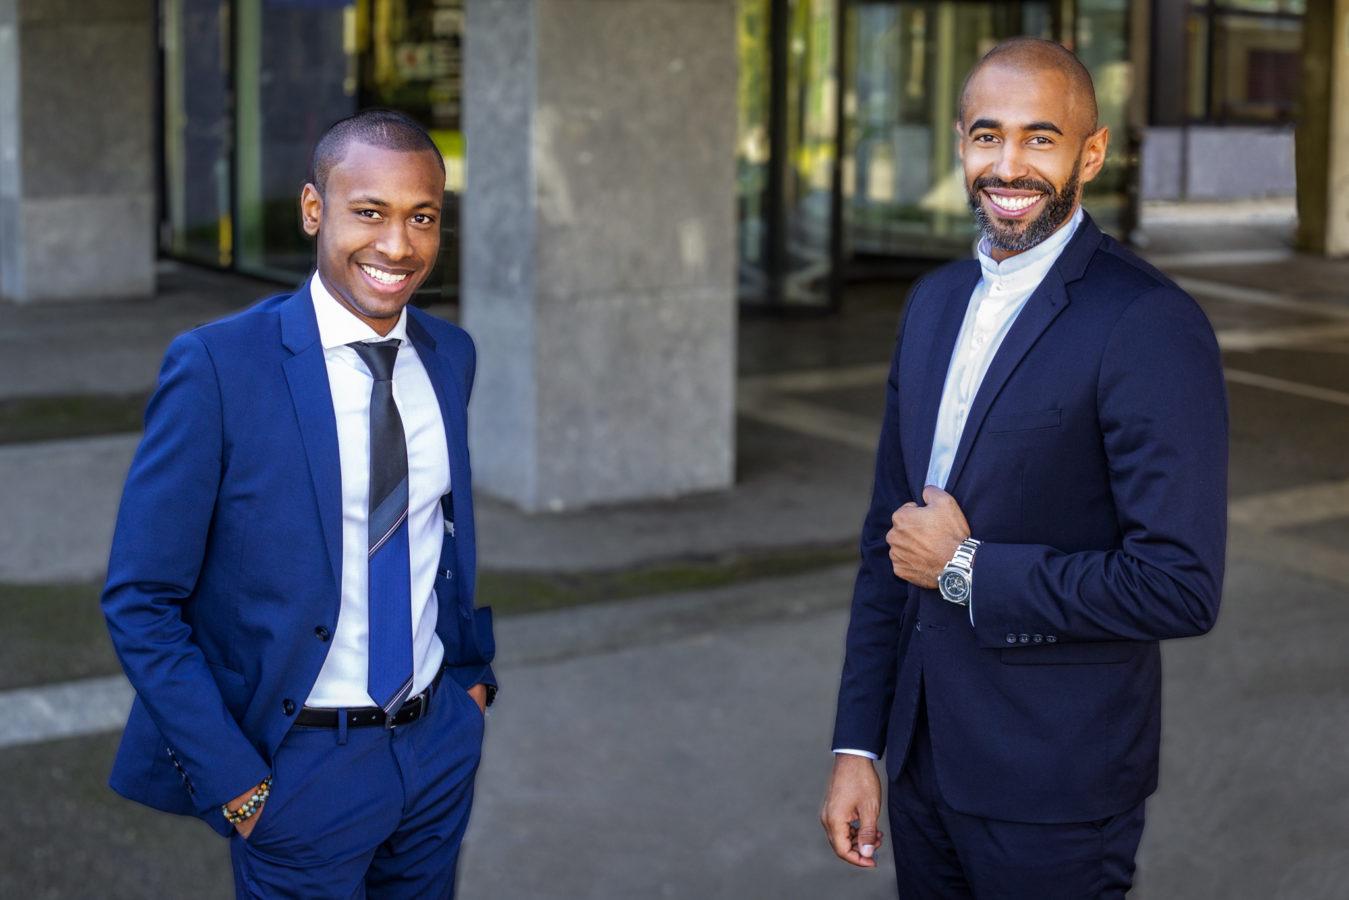 photo de killyam Baruncio et Gérald Lukuba en train de sourire